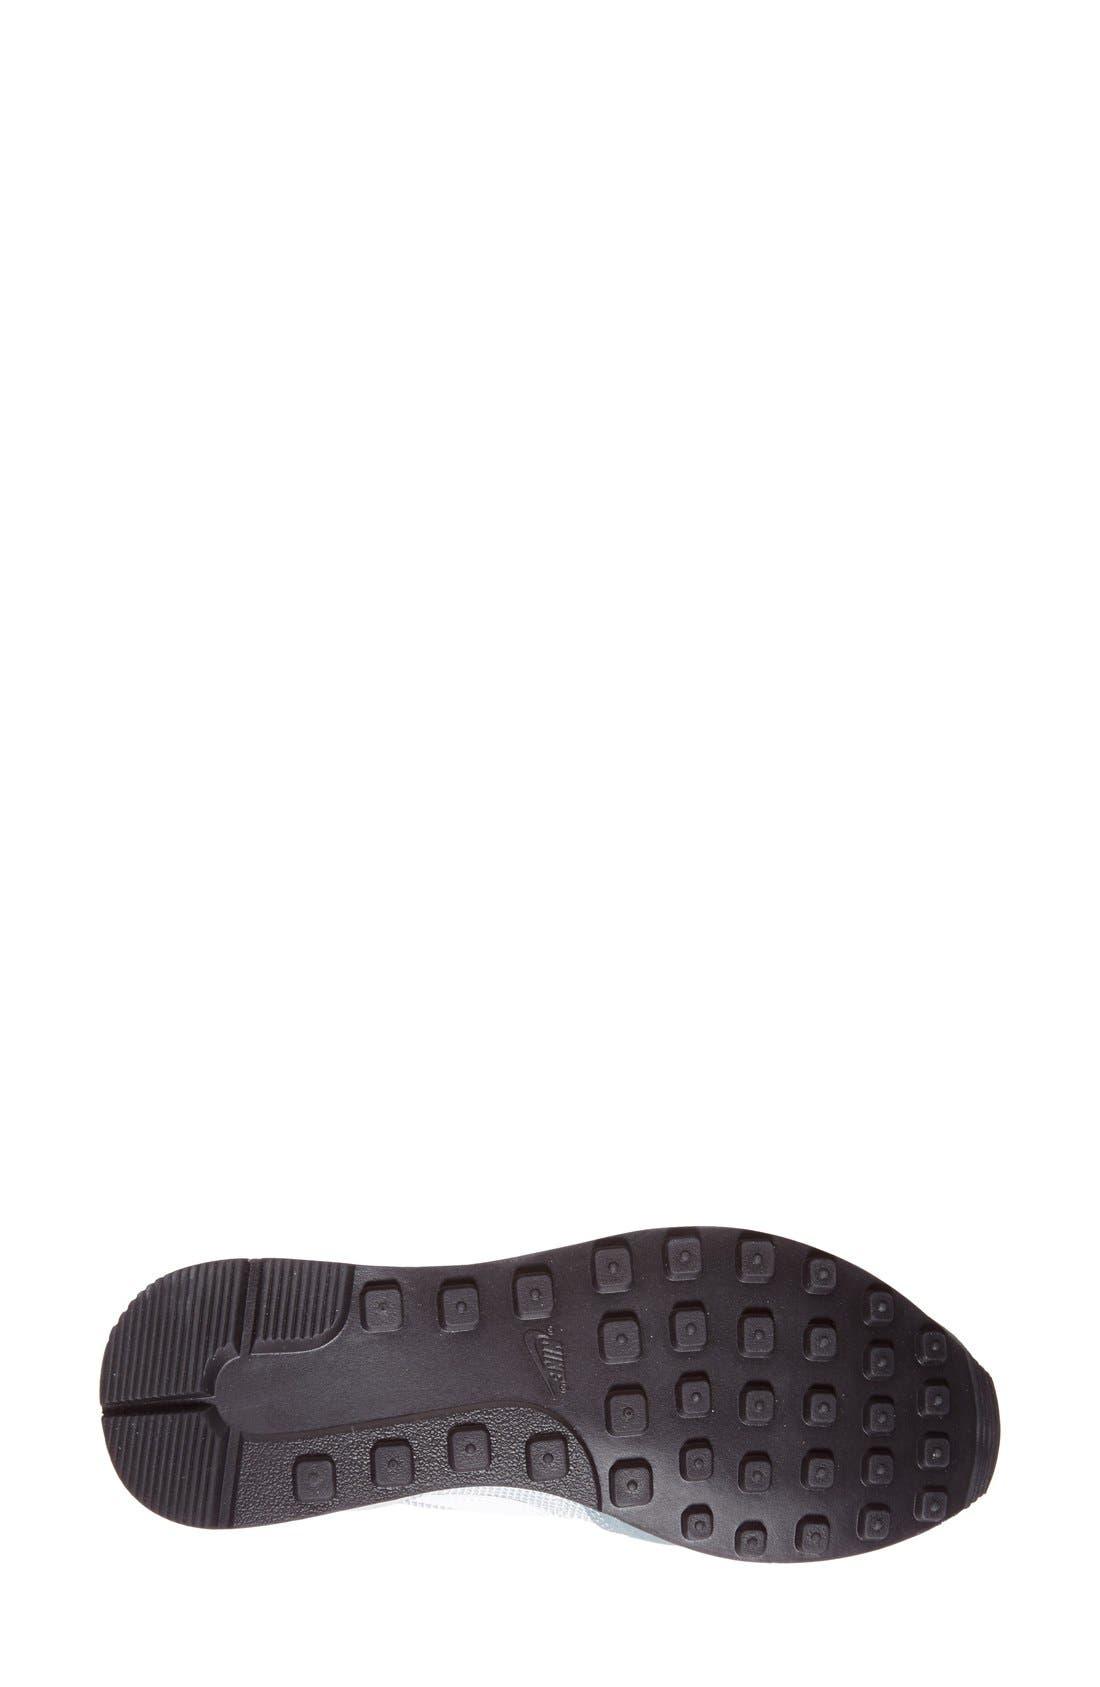 'Internationalist' Sneaker,                             Alternate thumbnail 4, color,                             Grey/ Platinum/ Black